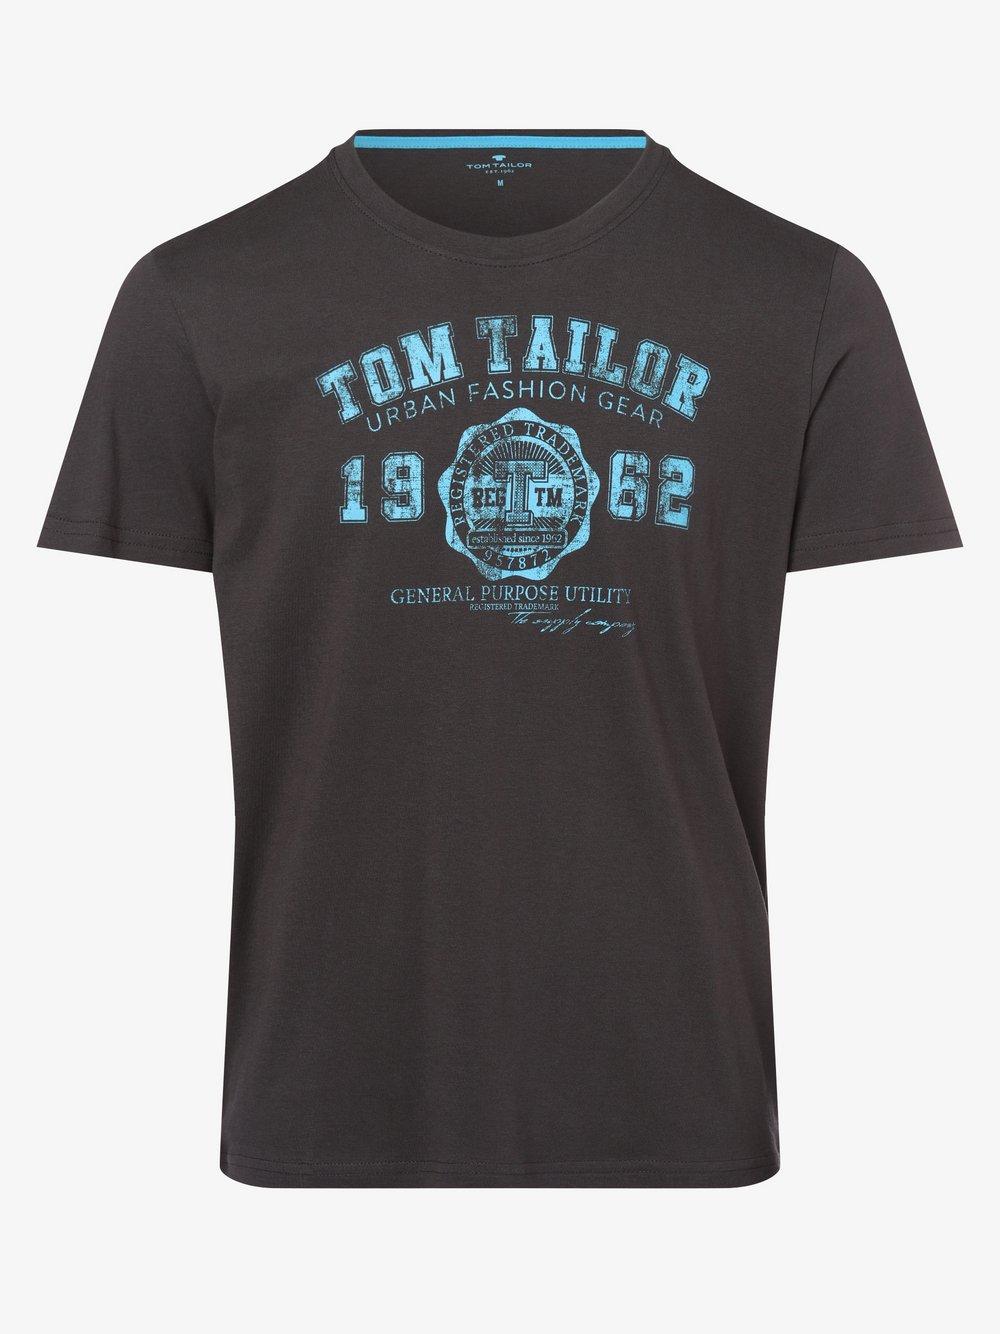 Tom Tailor – T-shirt męski, szary Van Graaf 487272-0003-09920